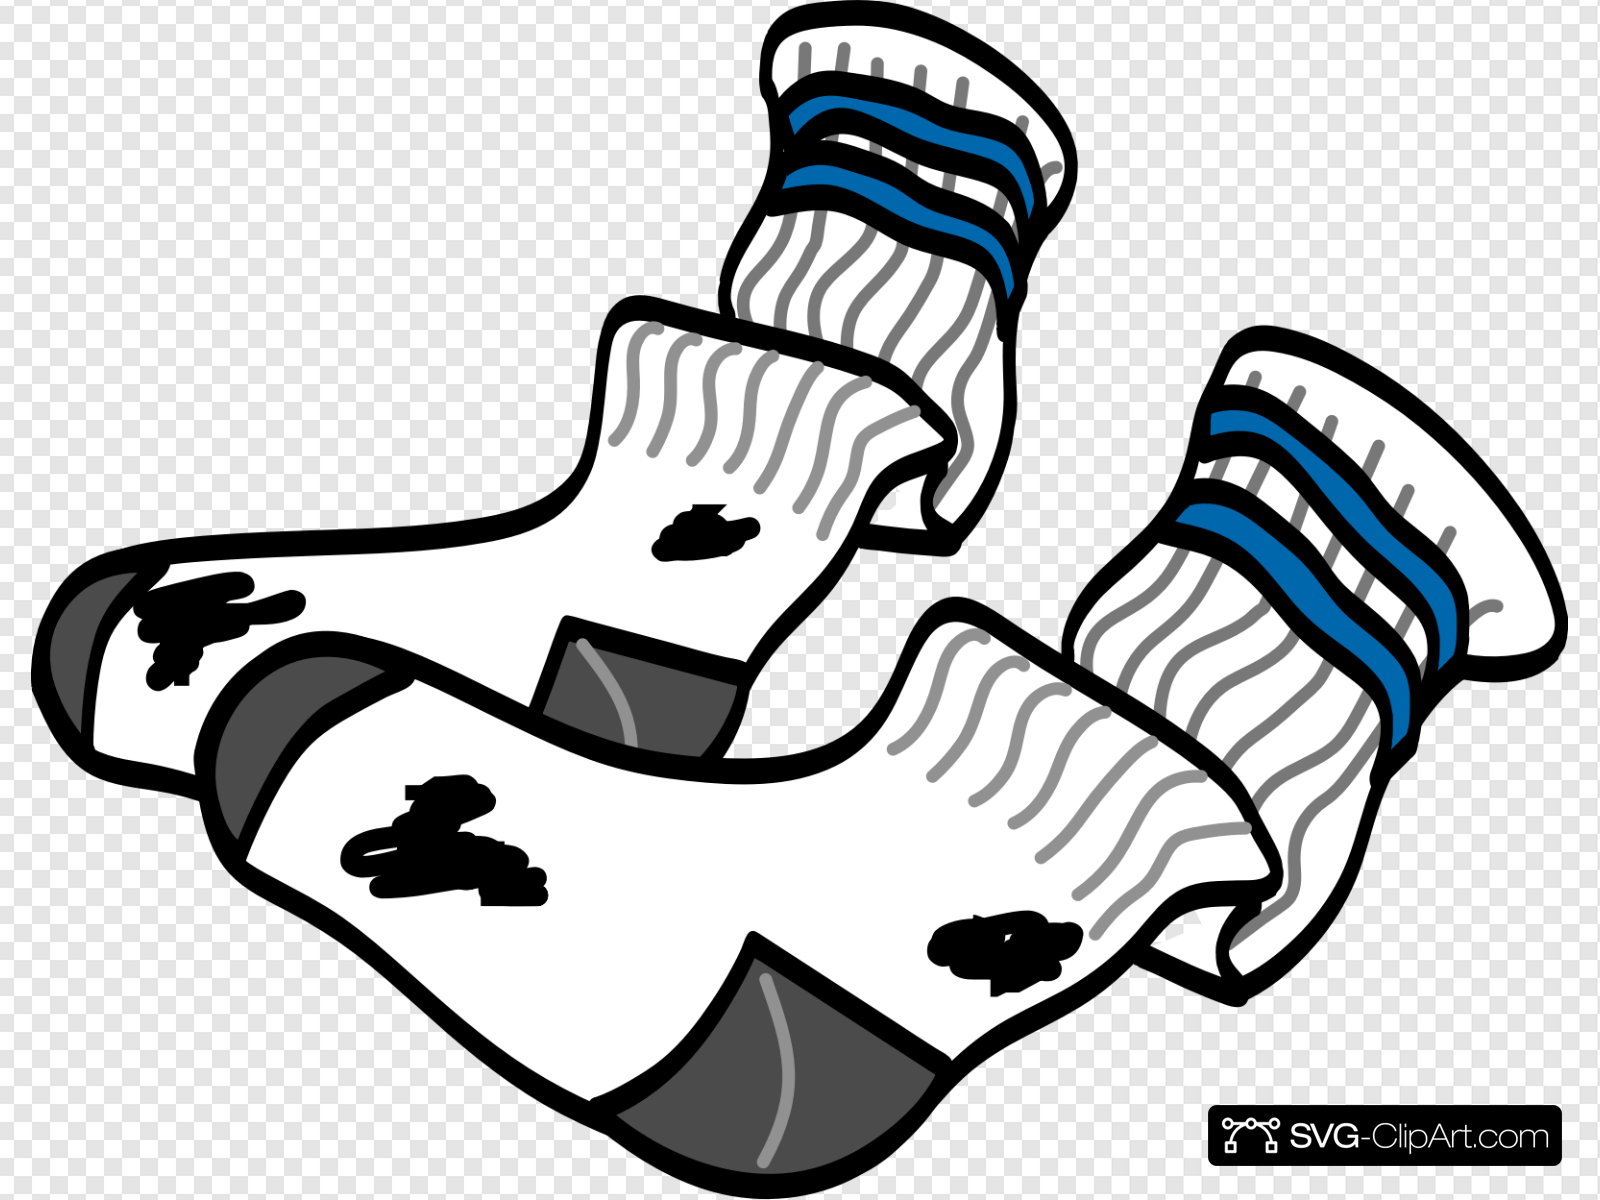 Clipart socks svg. Old clip art icon